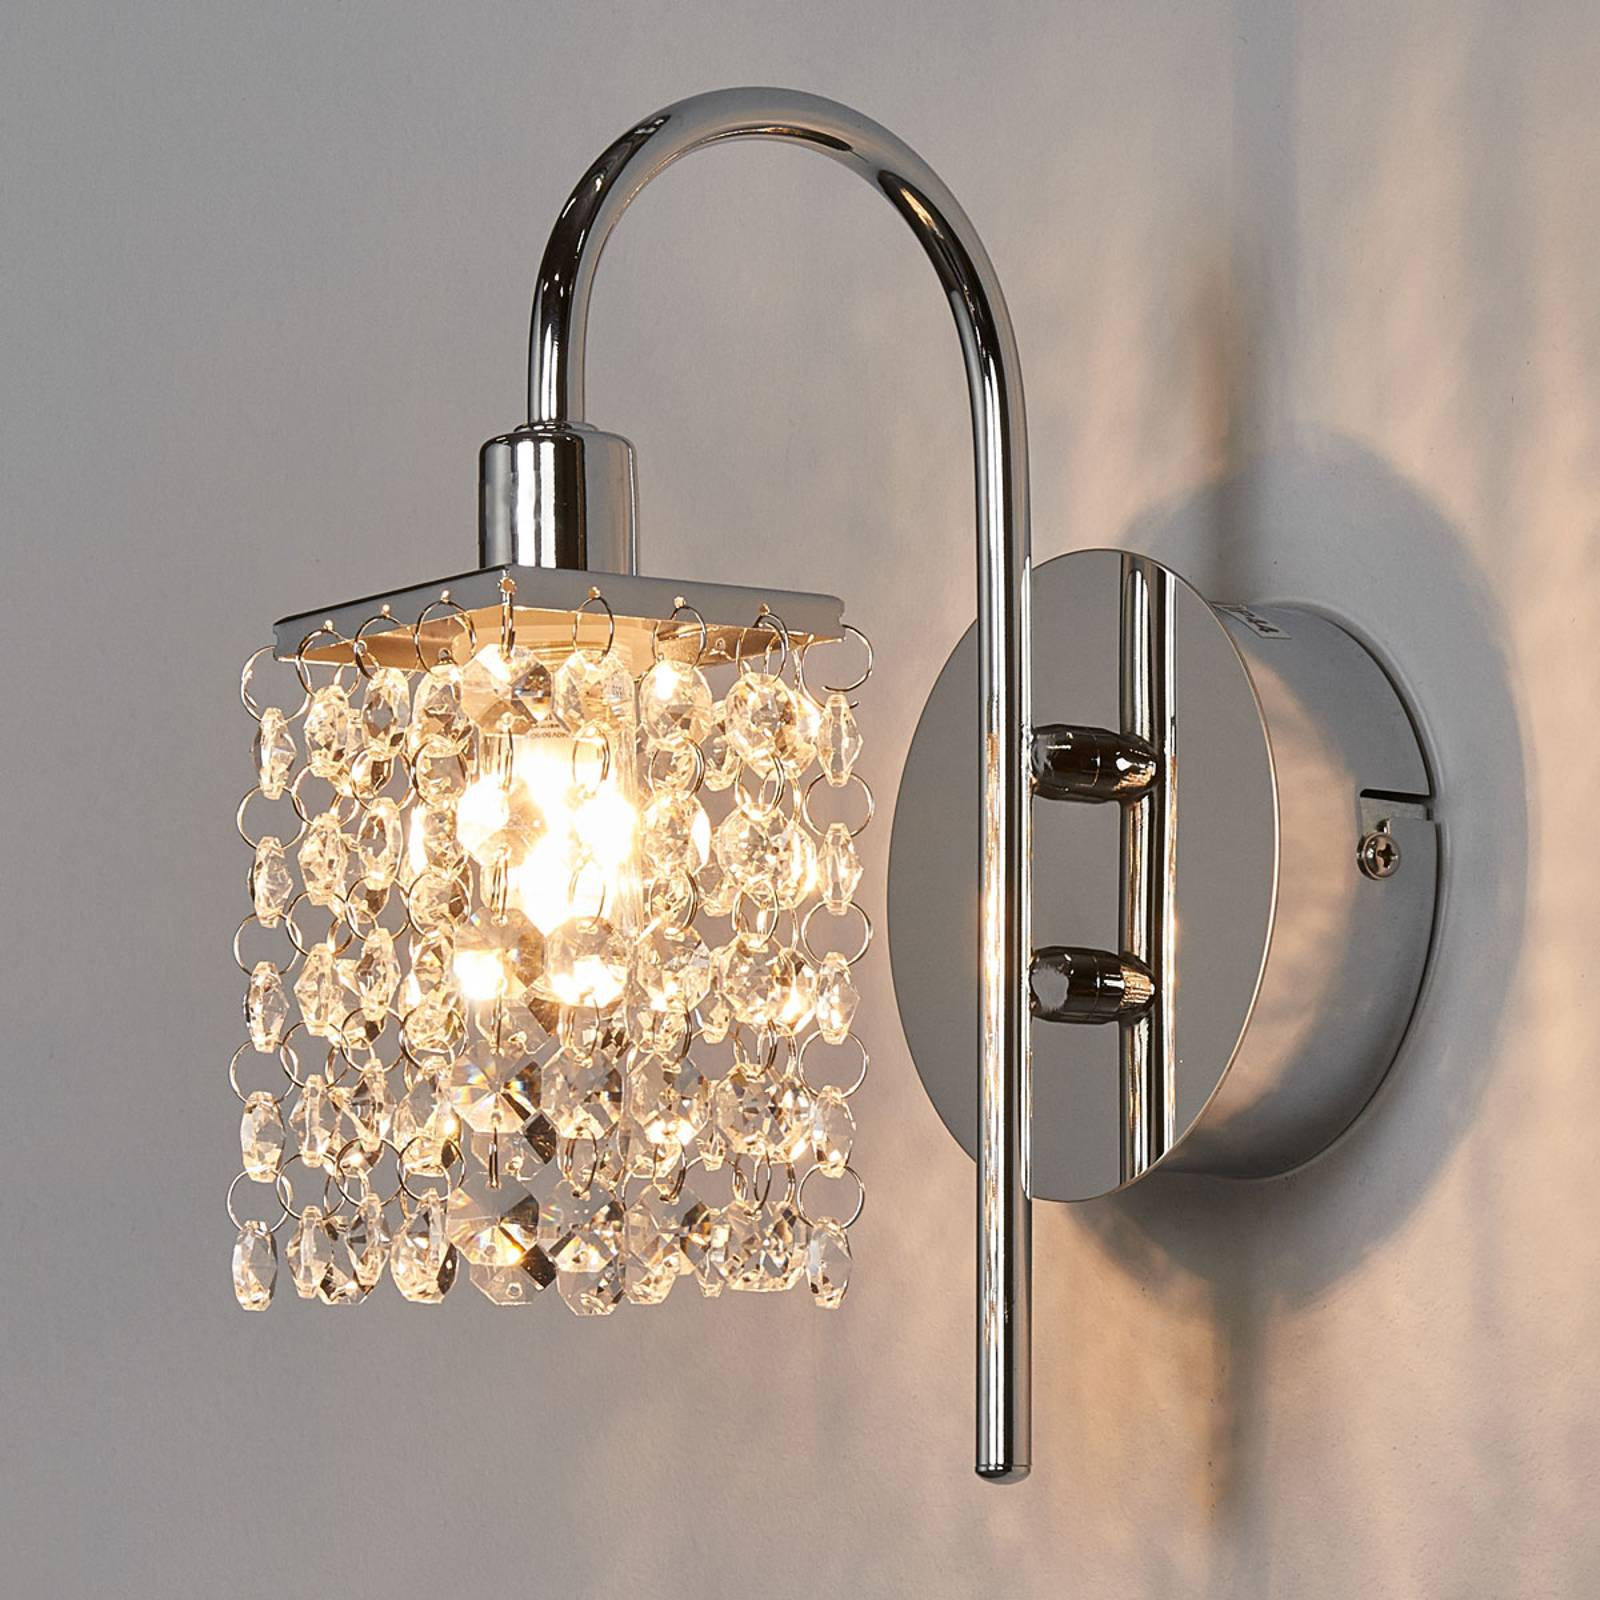 Mooie LED wandlamp Almonte m. glasgordijn IP 44